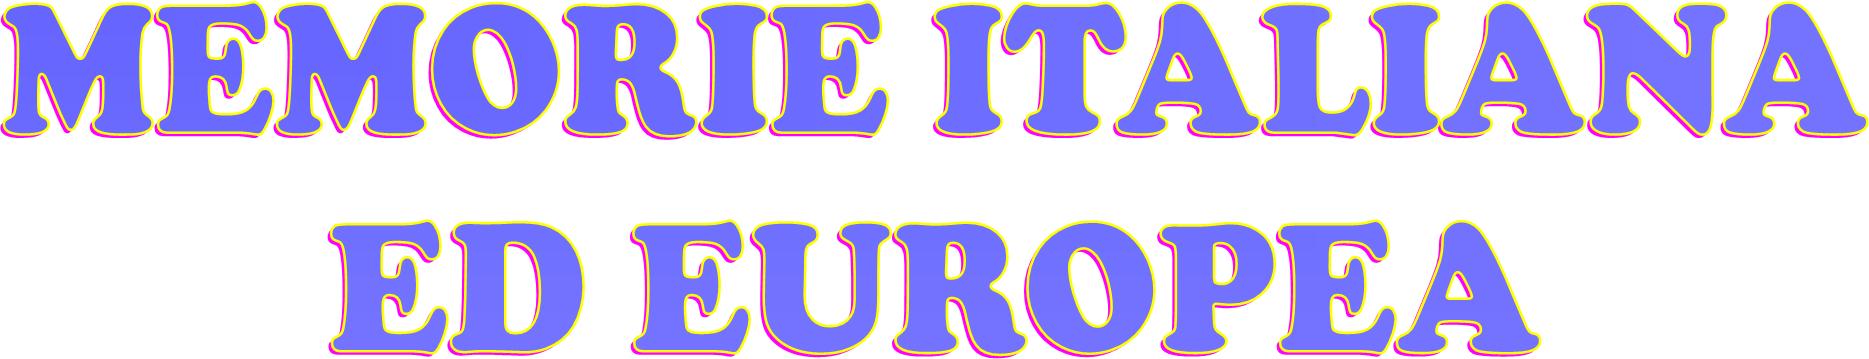 Memorie italiana ed europea